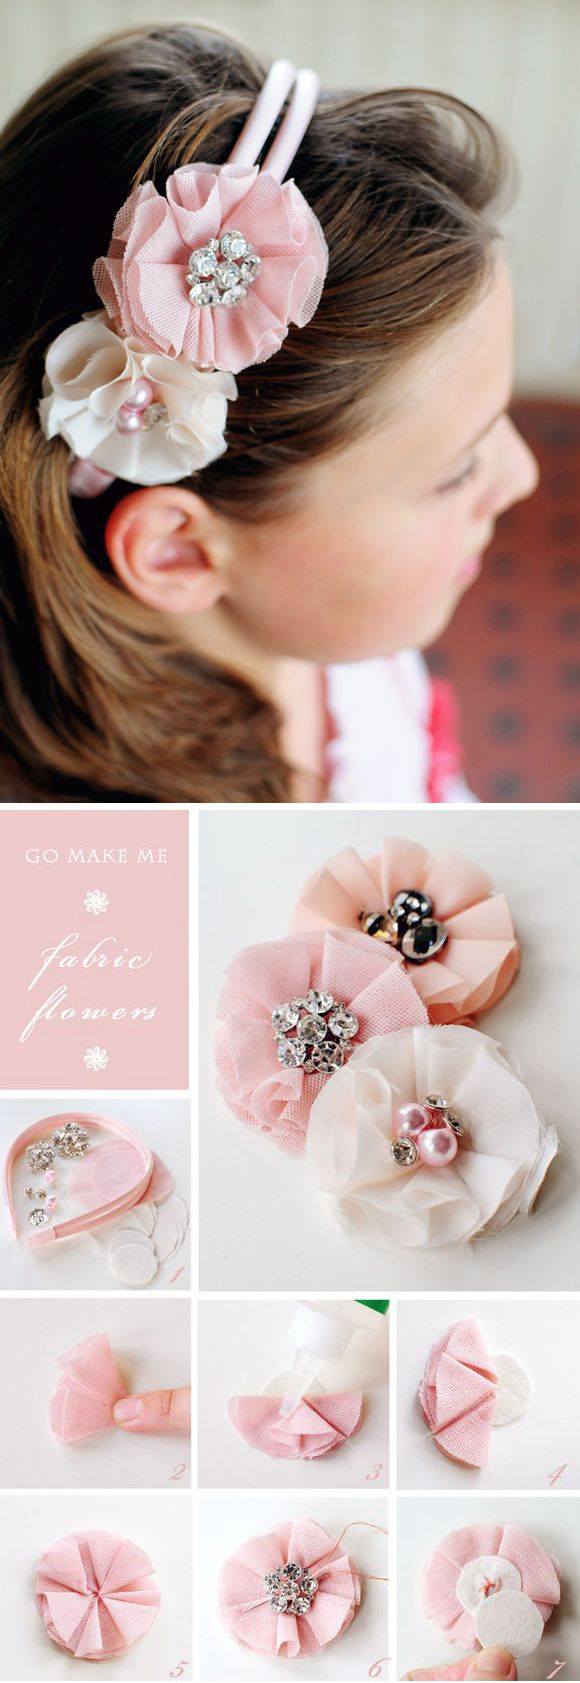 bejewelled flower headband